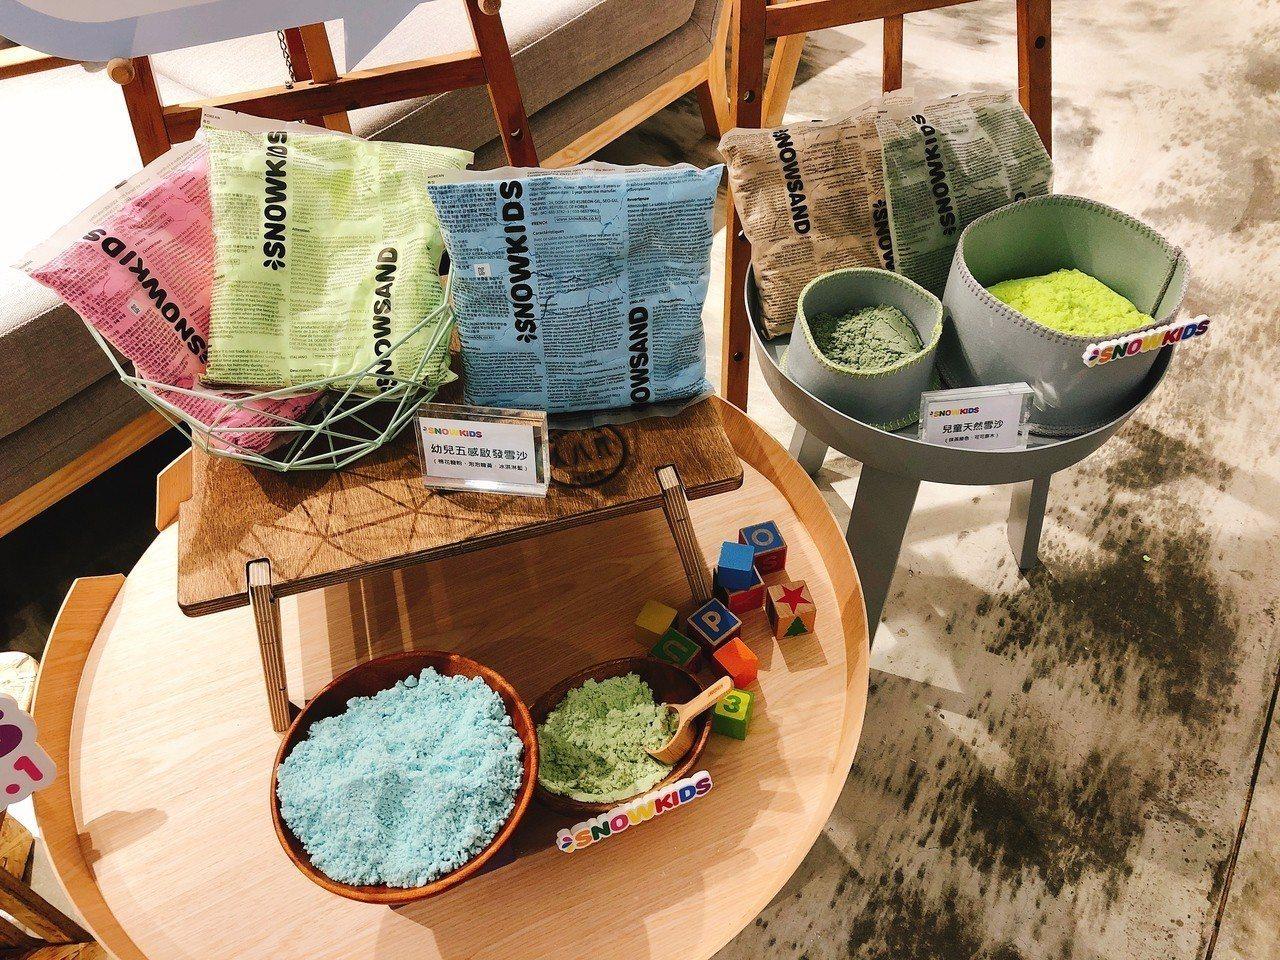 SNOWKIDS天然雪沙系列,可任意揉捏、塑形、混色。記者黃筱晴/攝影